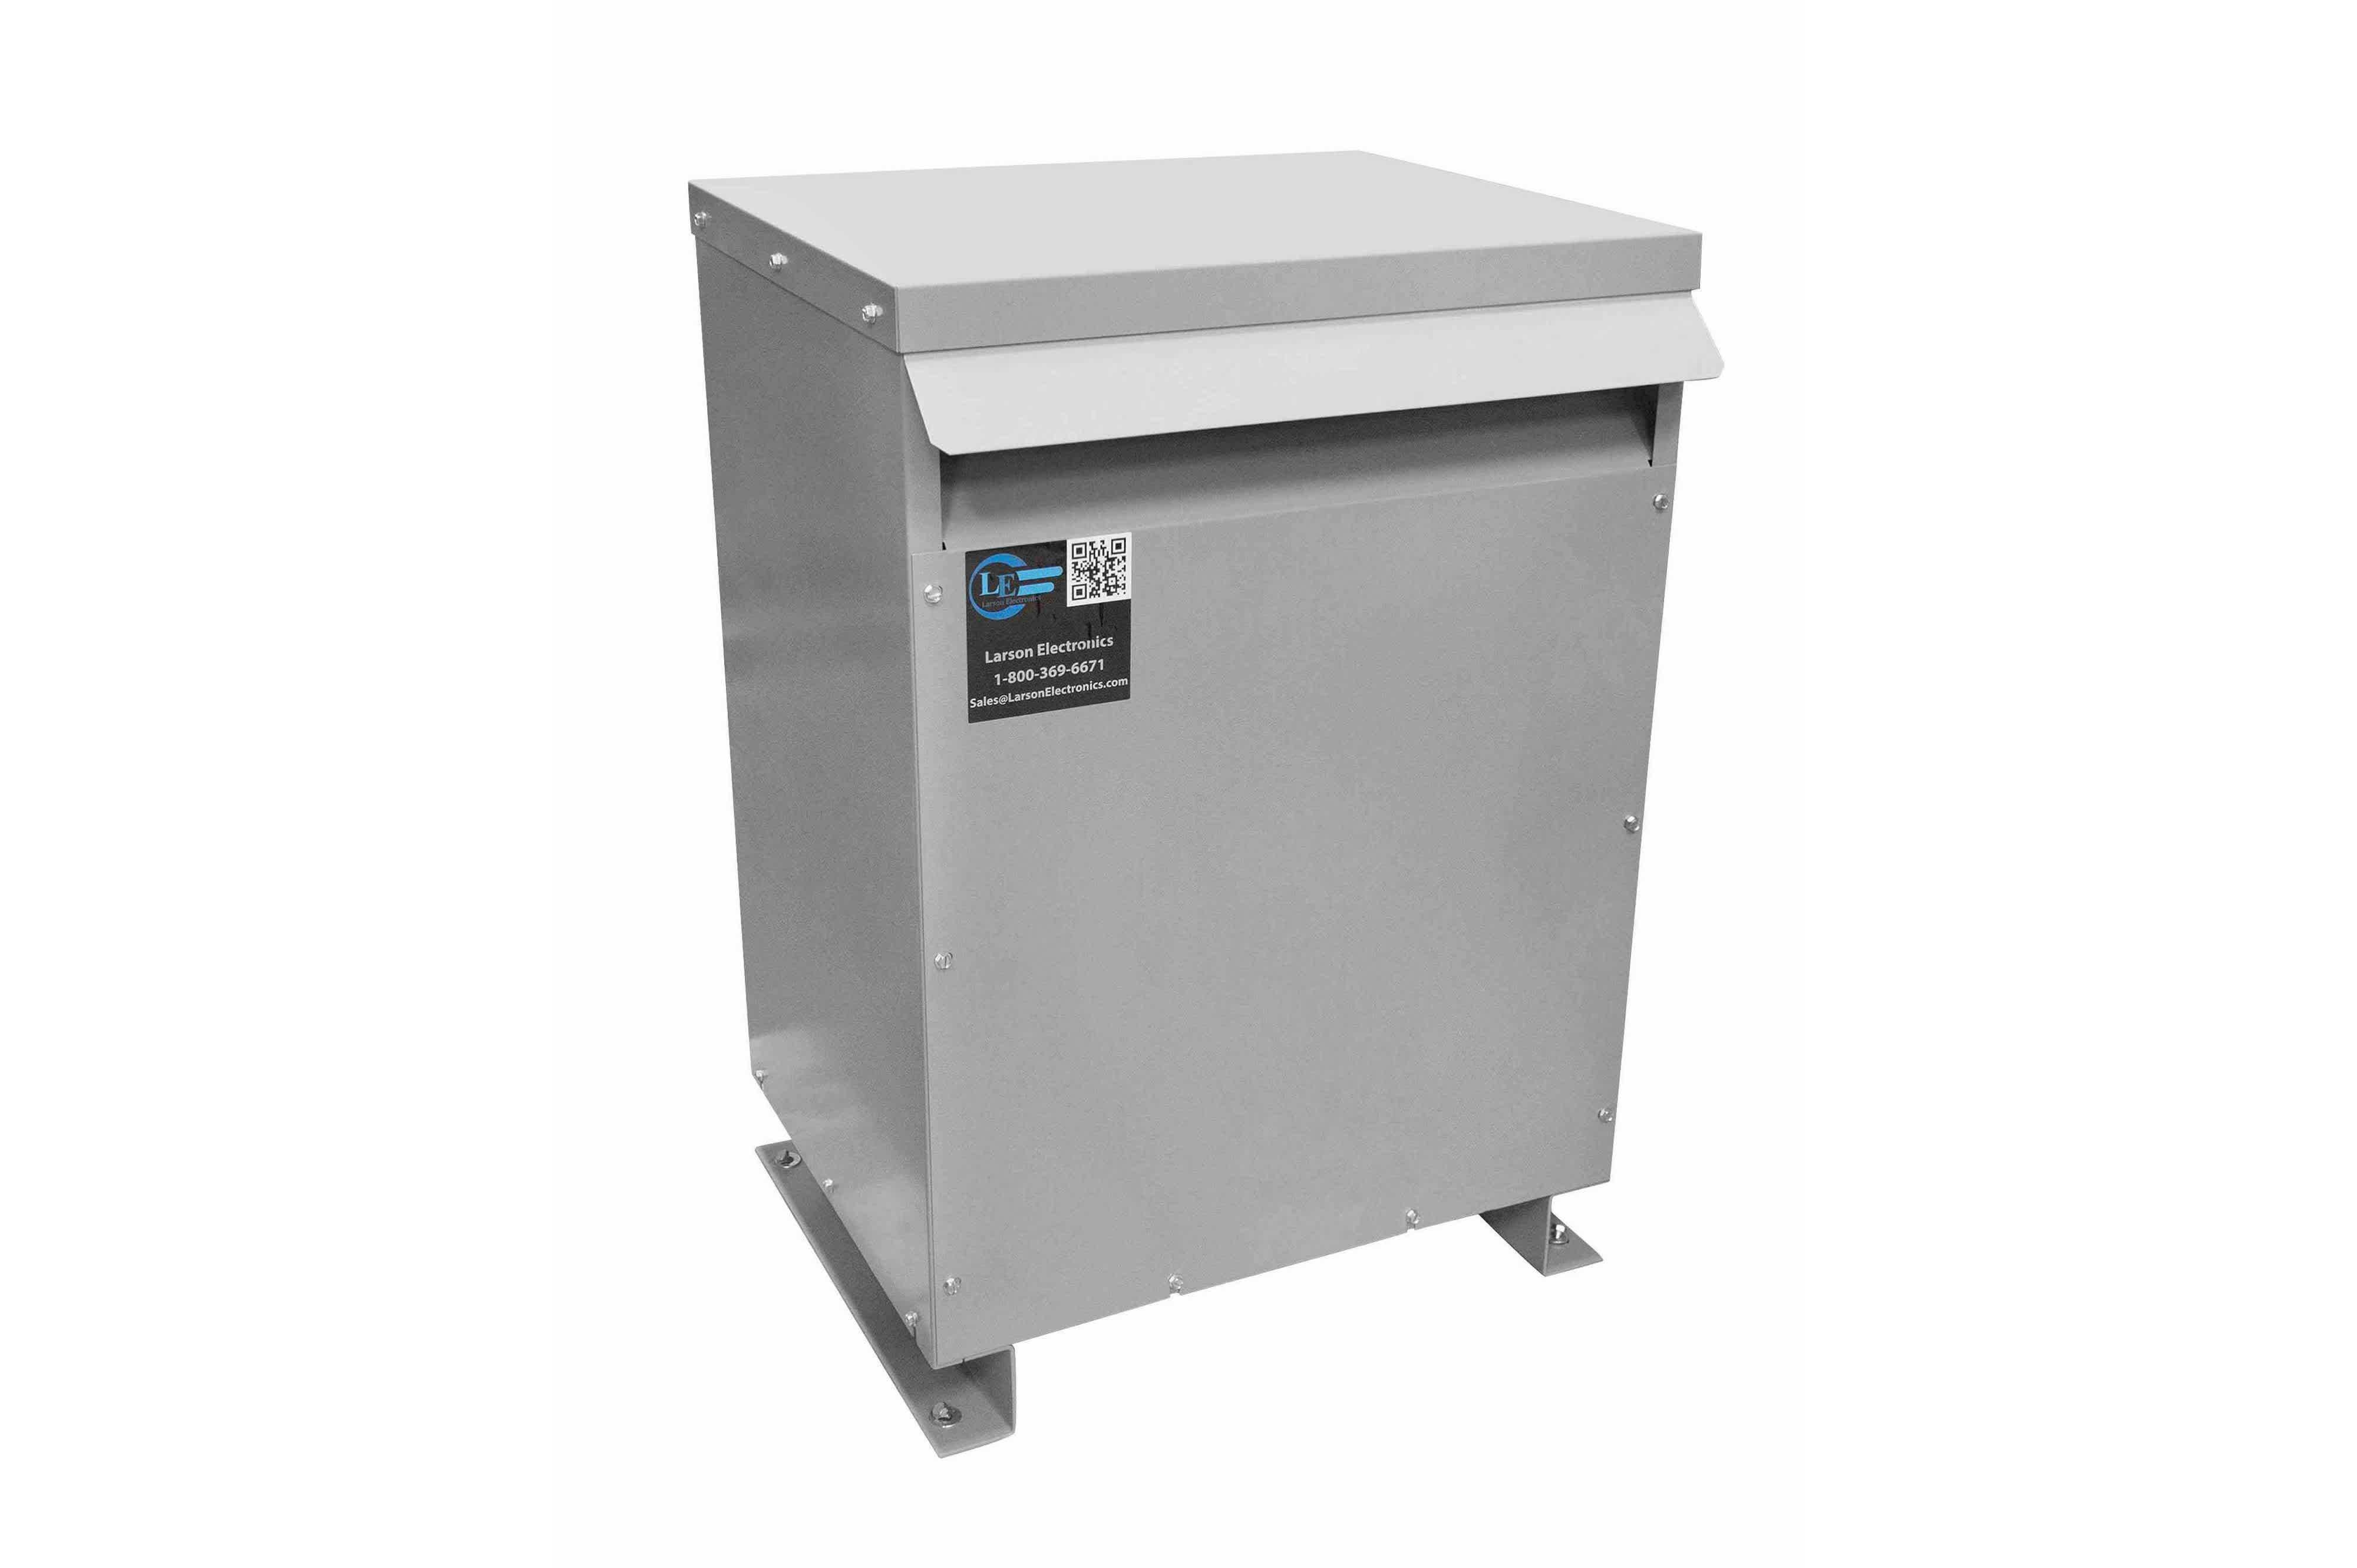 275 kVA 3PH Isolation Transformer, 460V Wye Primary, 208V Delta Secondary, N3R, Ventilated, 60 Hz